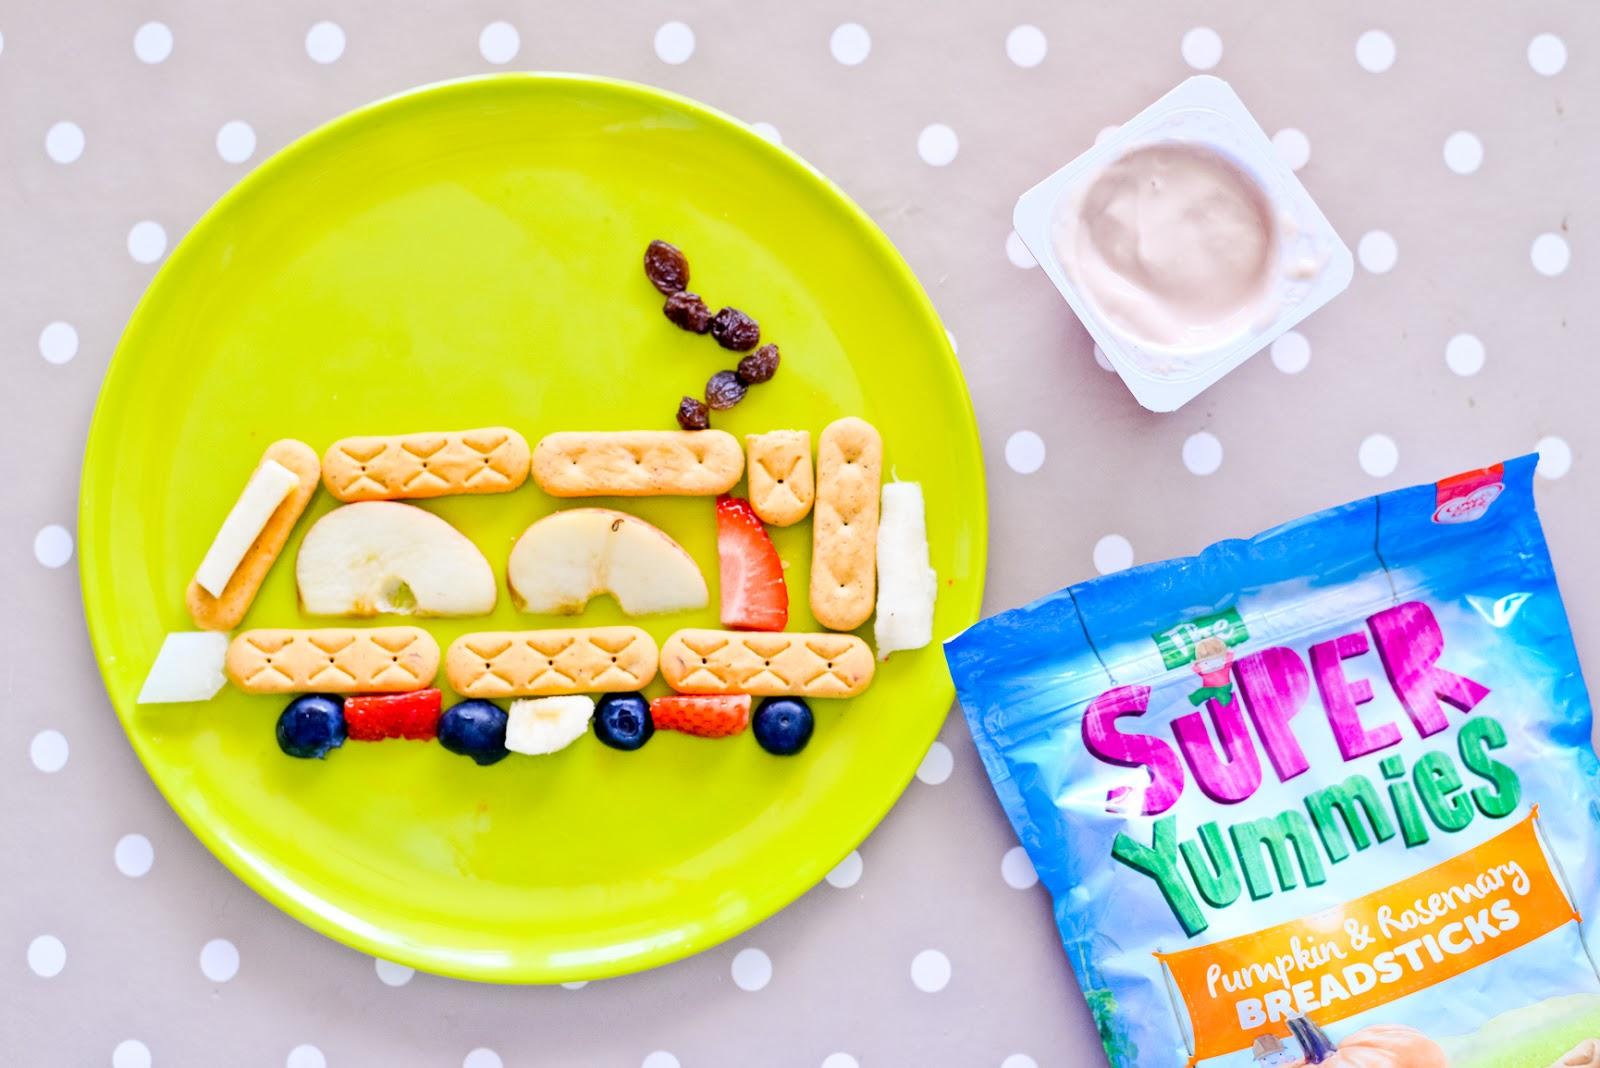 fun snack ideas for kids, toddler snack ideas, toddler snacks, healthy snacks for kids, train snack idea